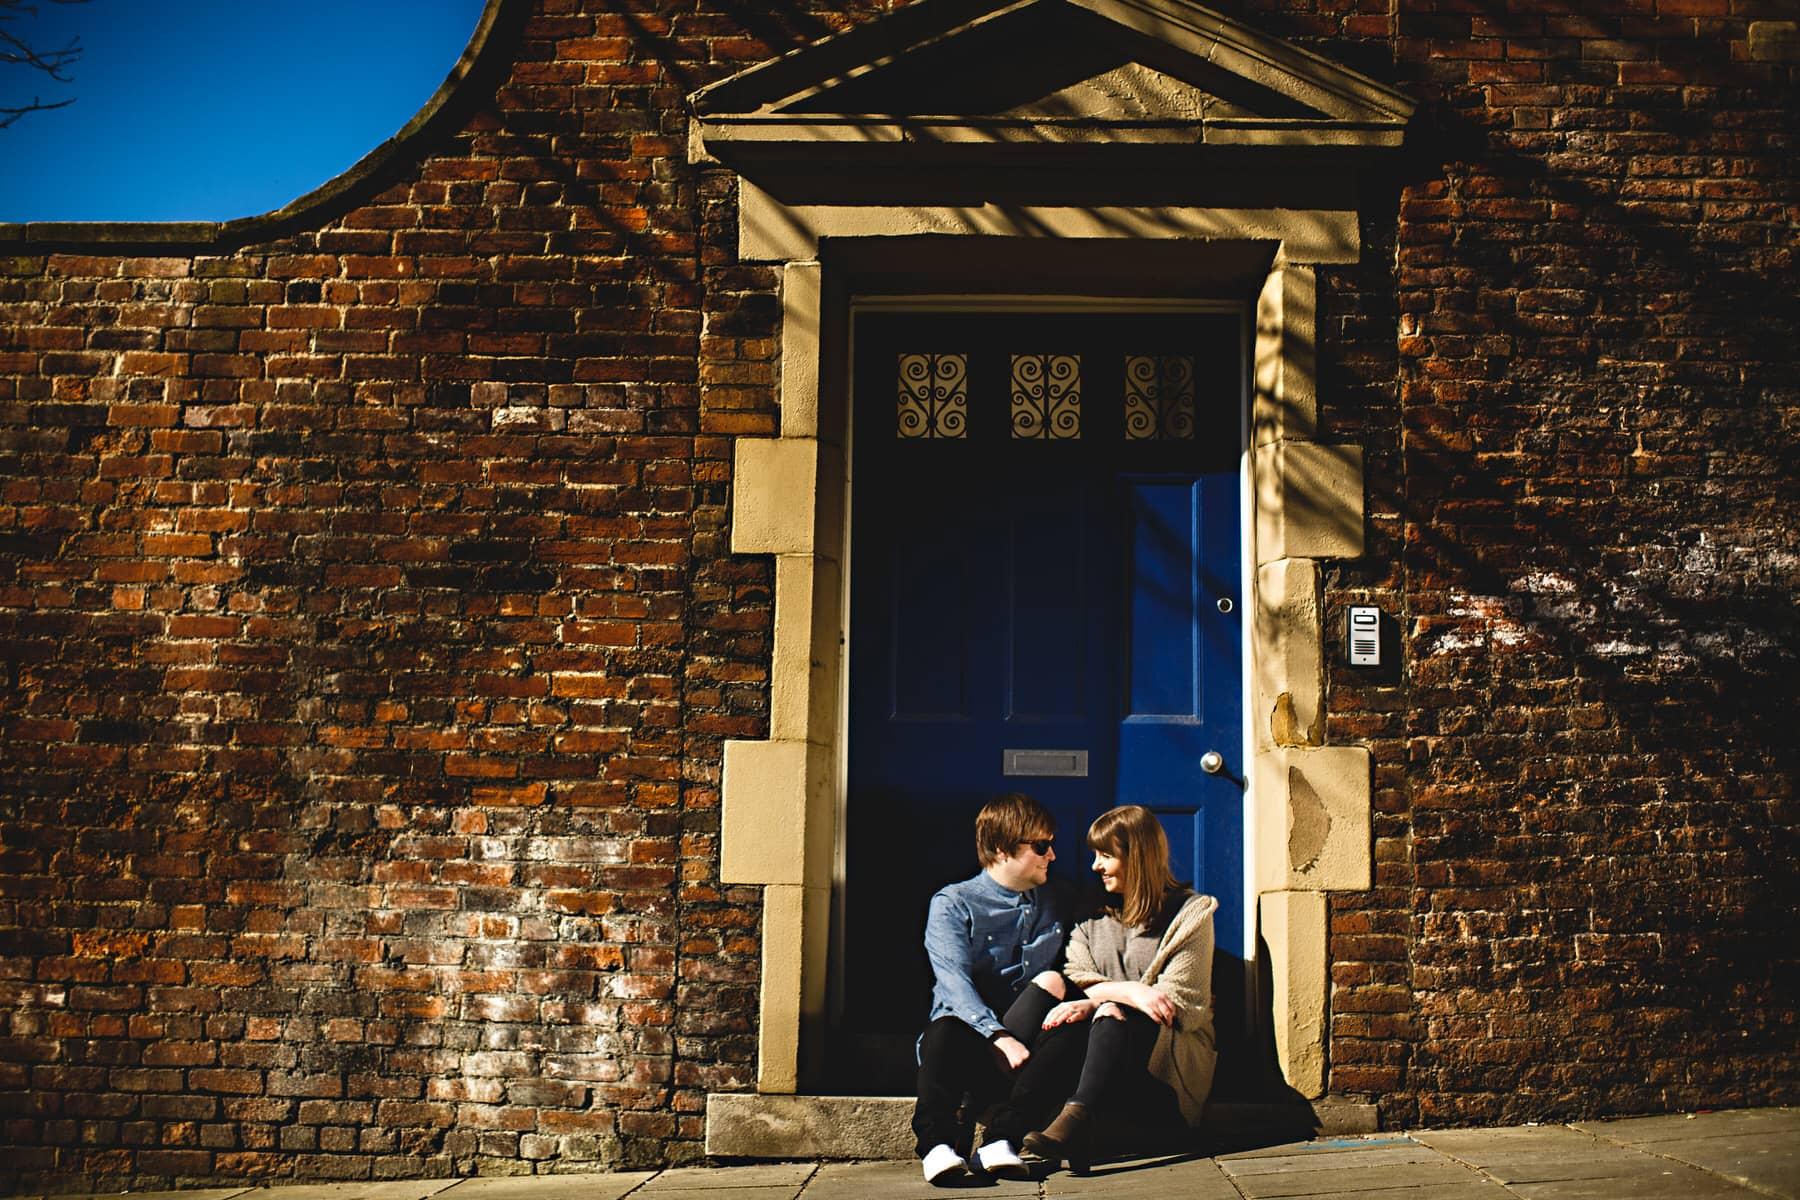 a couple sat on the door step in front of a blue door